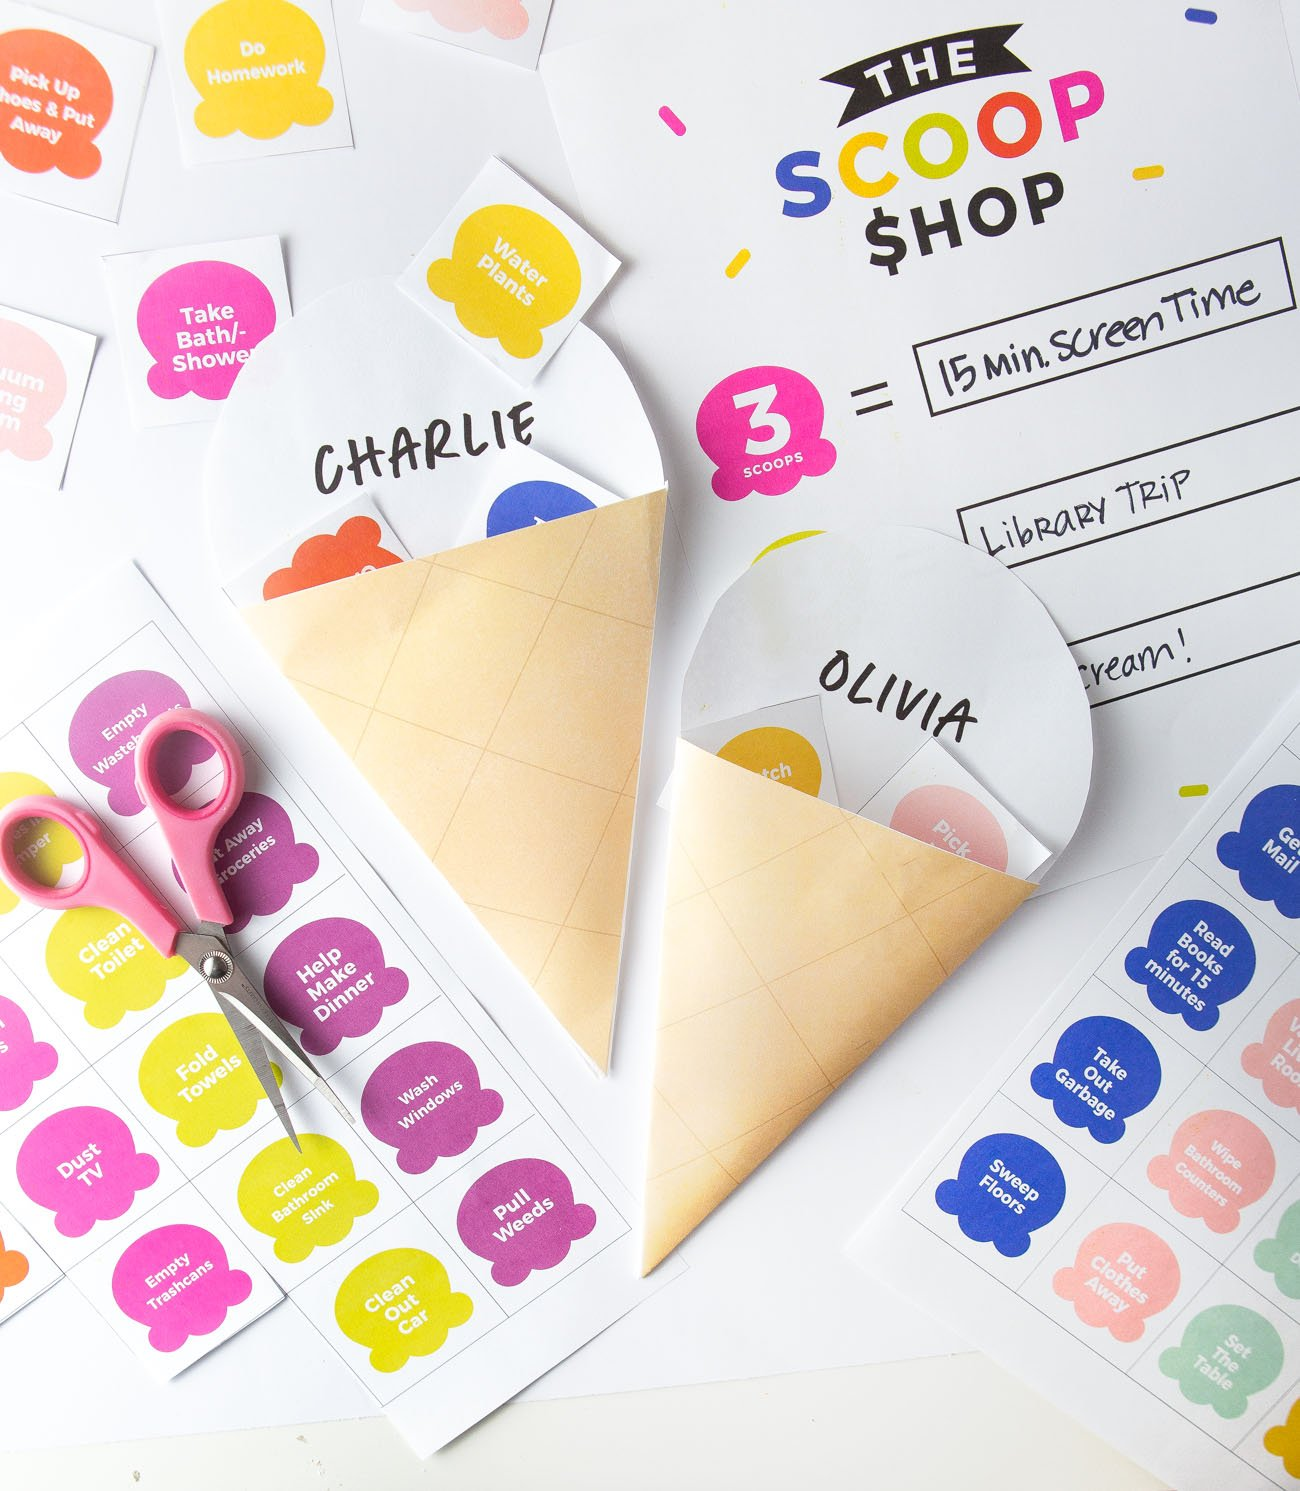 Icecream Printable Chore Chart